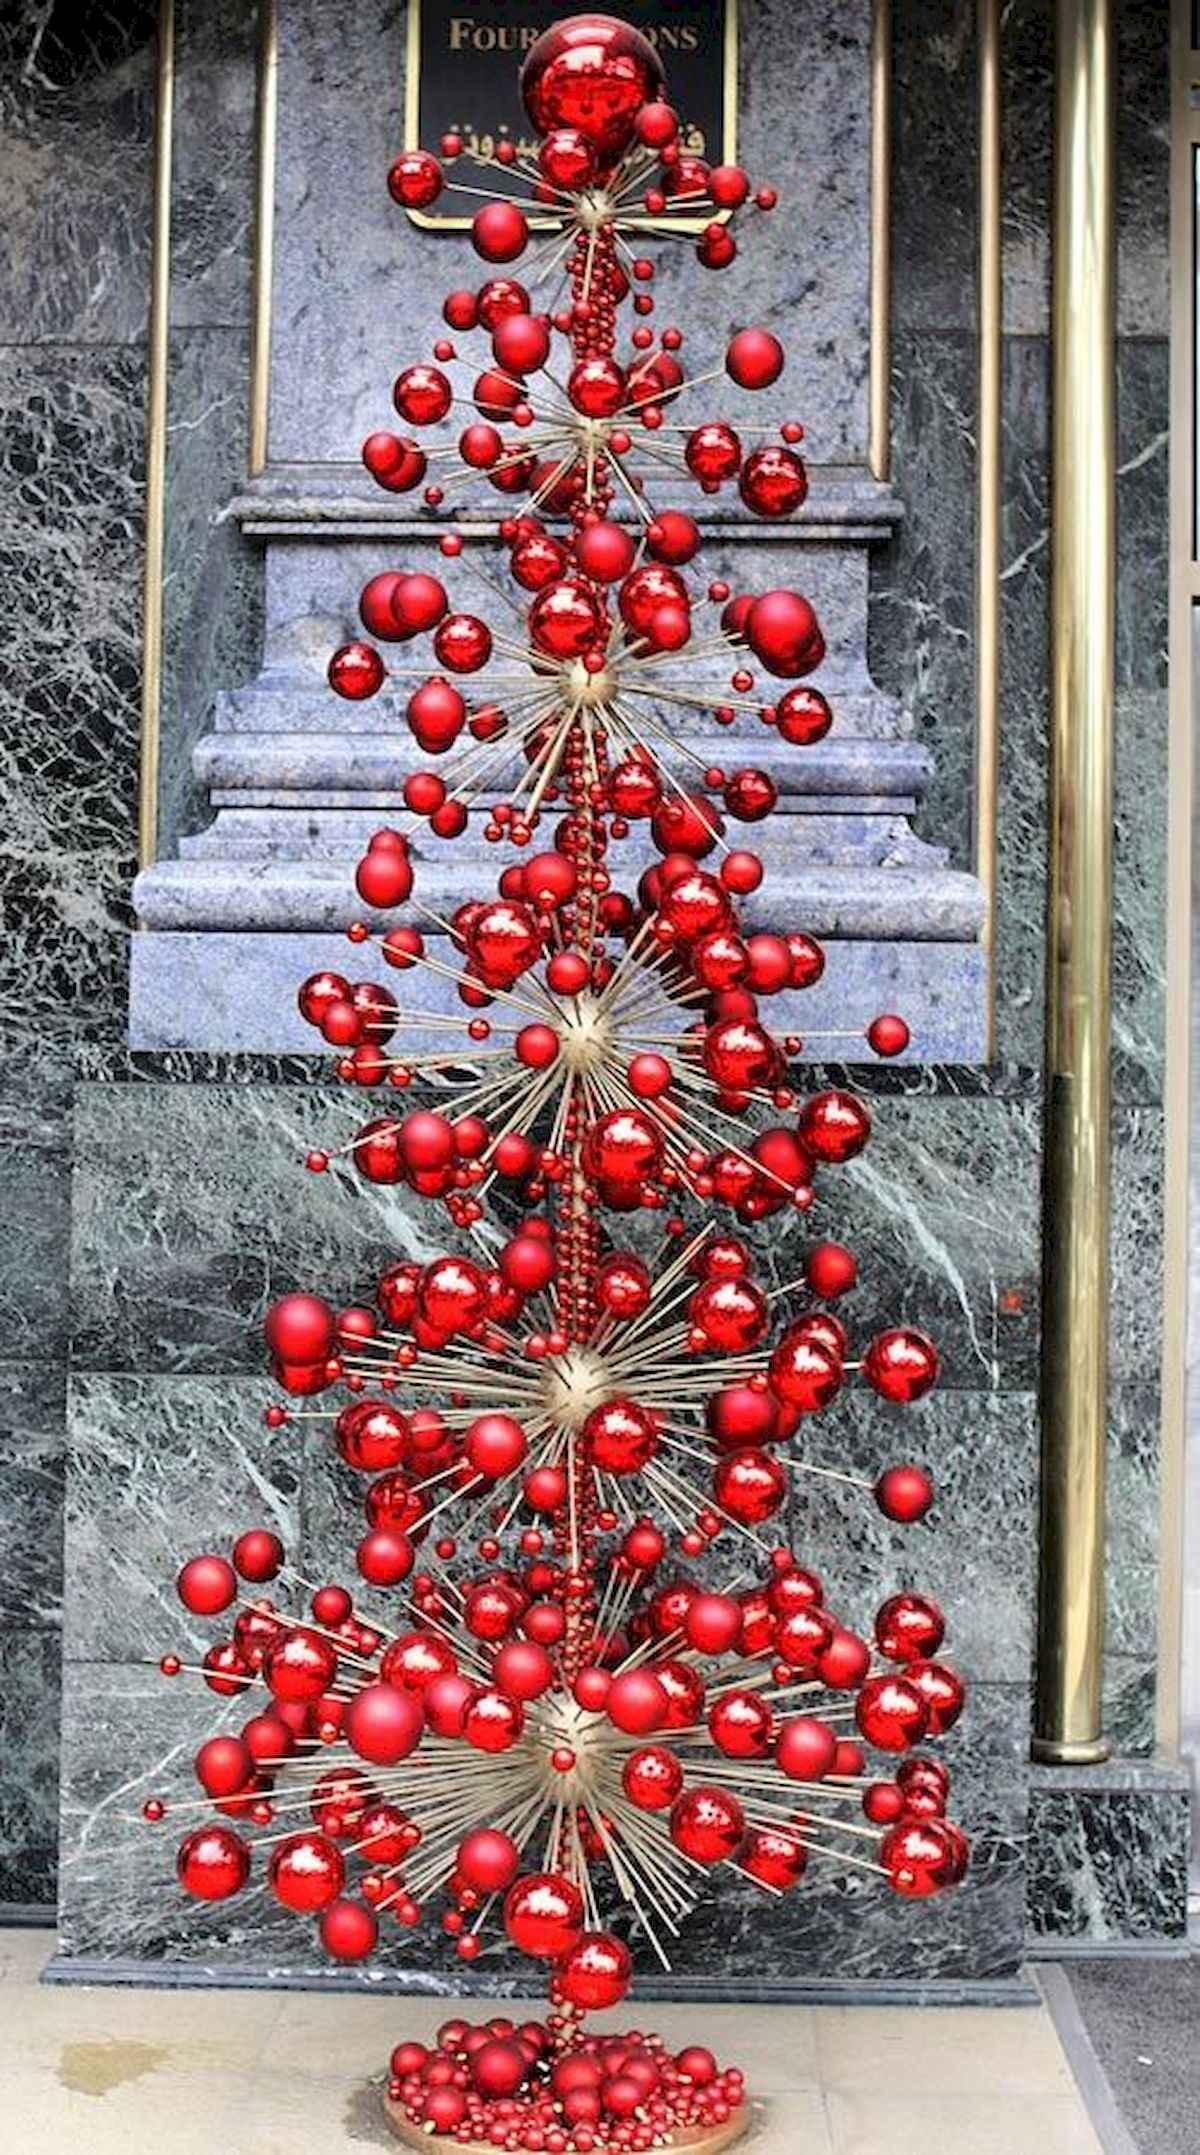 40 unique christmas tree ideas decorations (12)